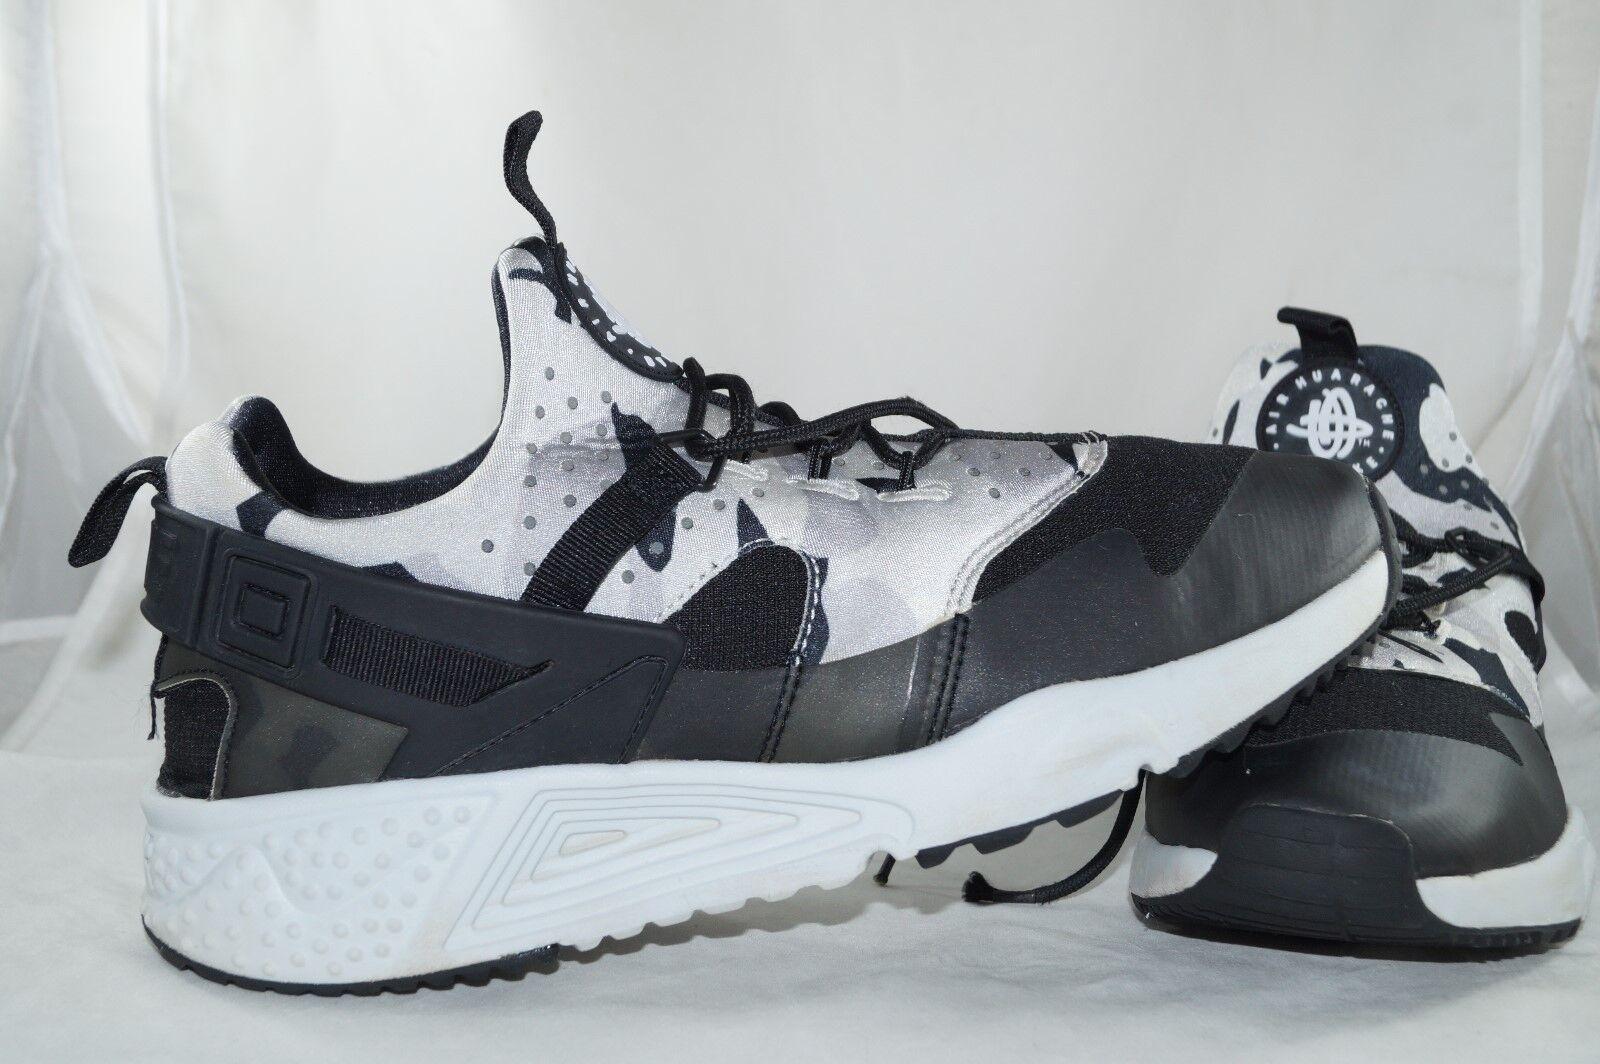 Nike Air 44 huarache utility negro GR: 44 Air aerobic calzado deportivo b58e3f